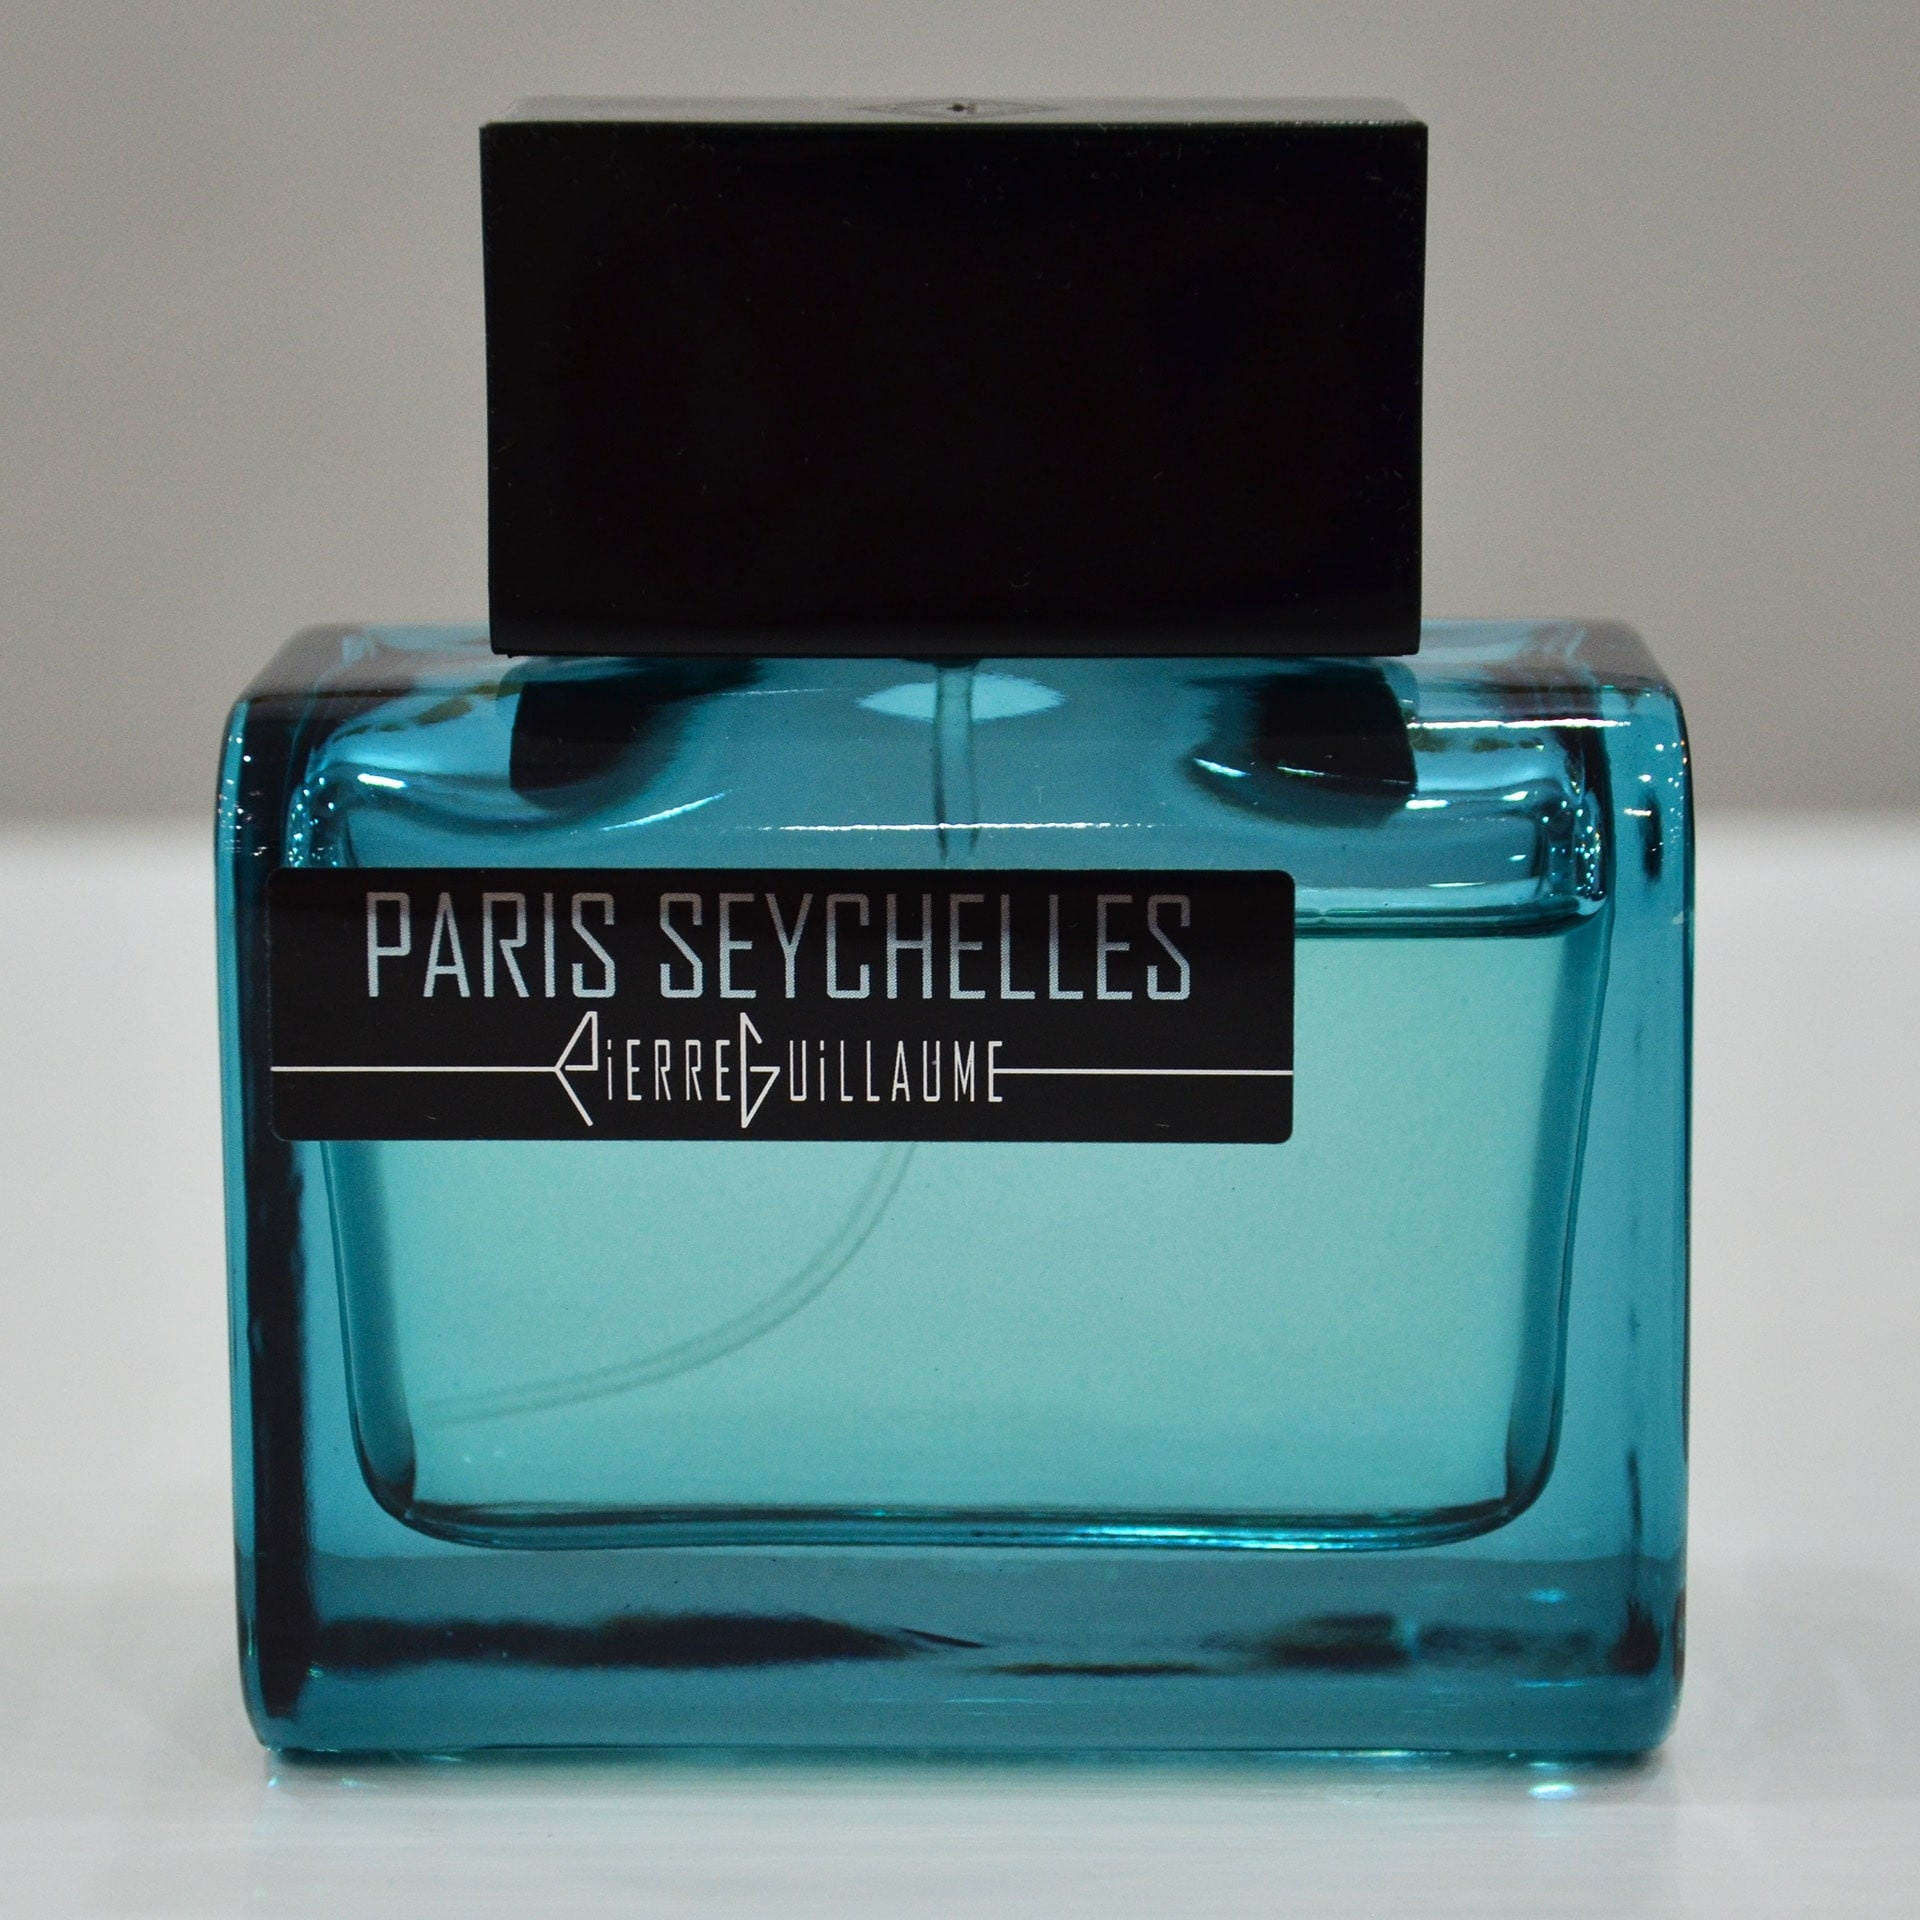 Ароматы Pierre Guillaume Collection Croisiere Paris Seychelles